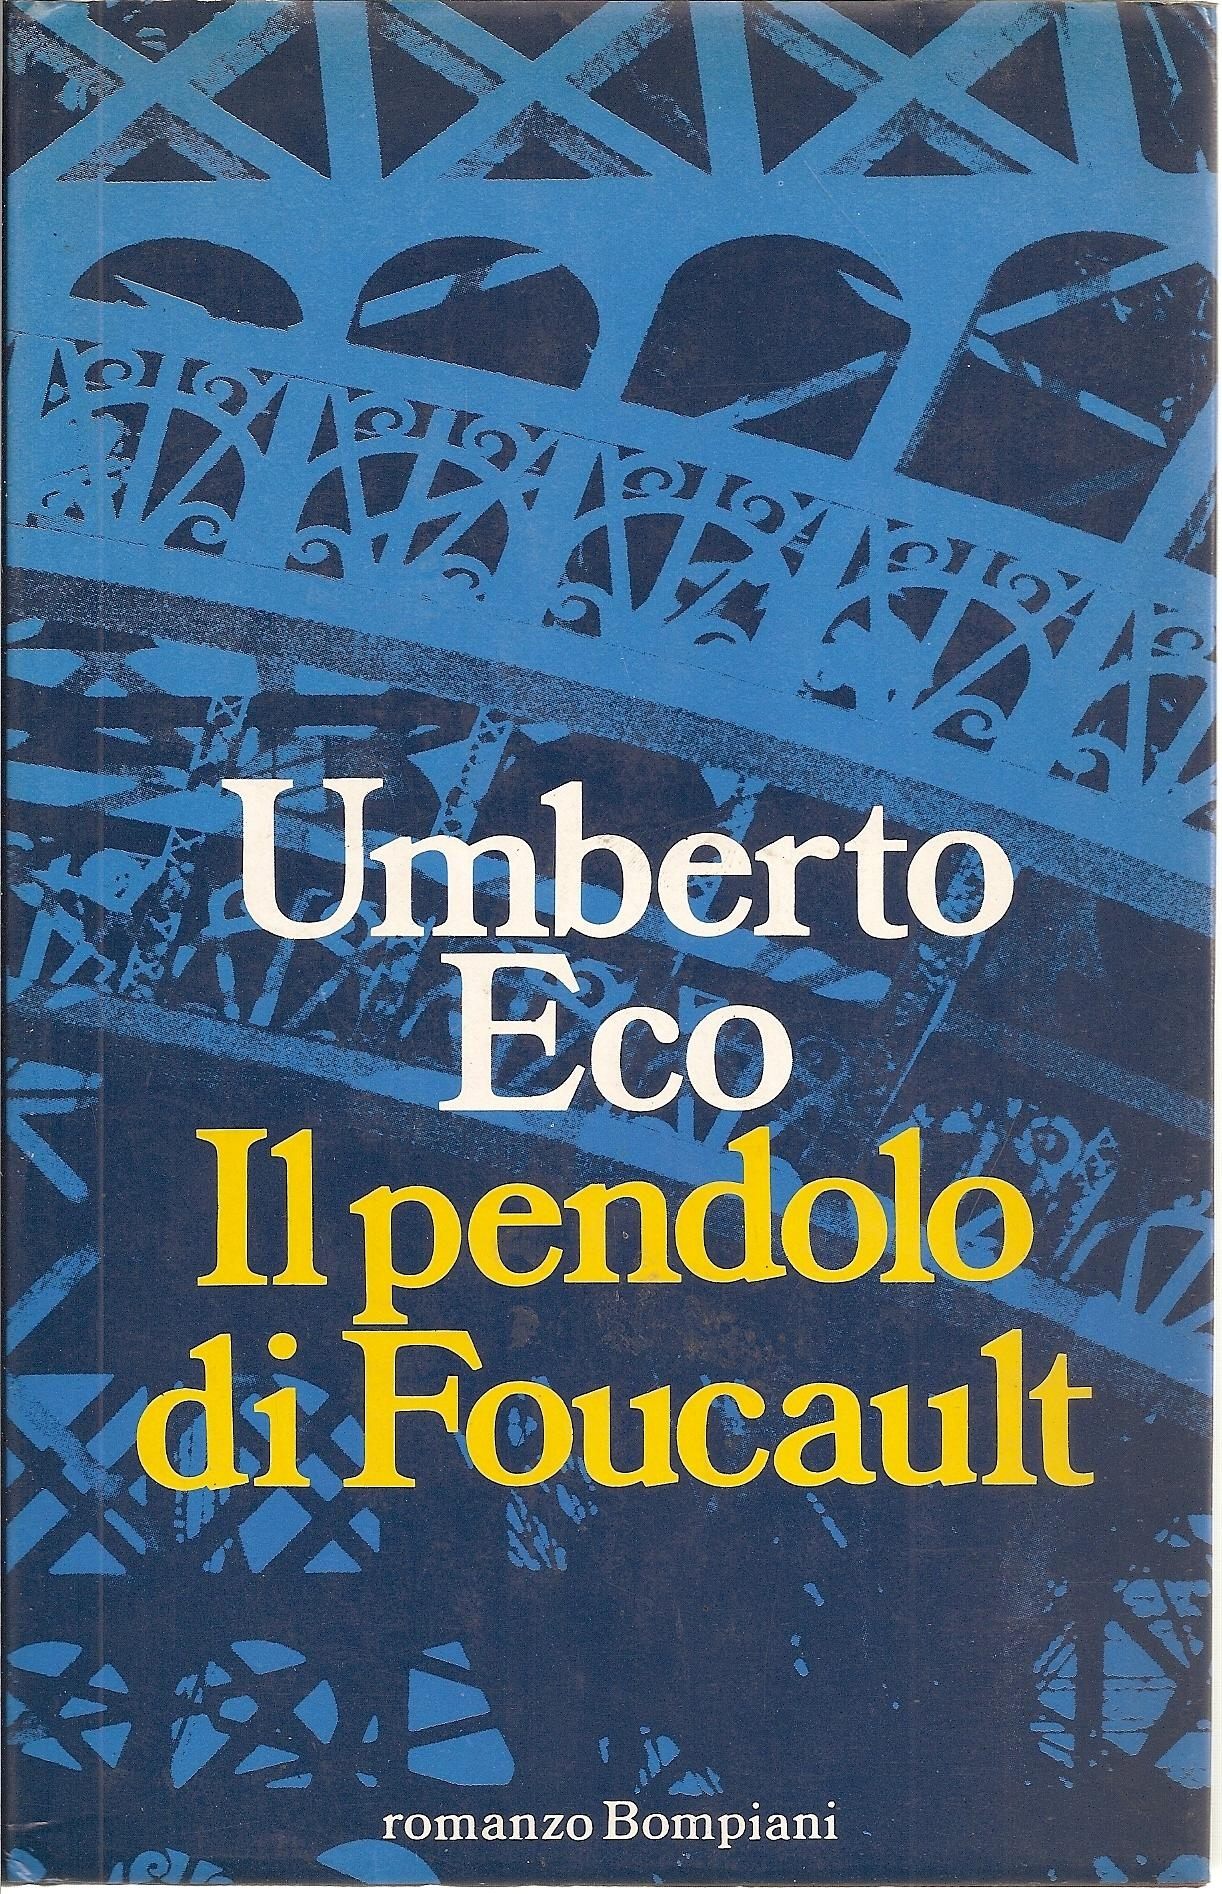 Léon Foucault pendolo di Foucault